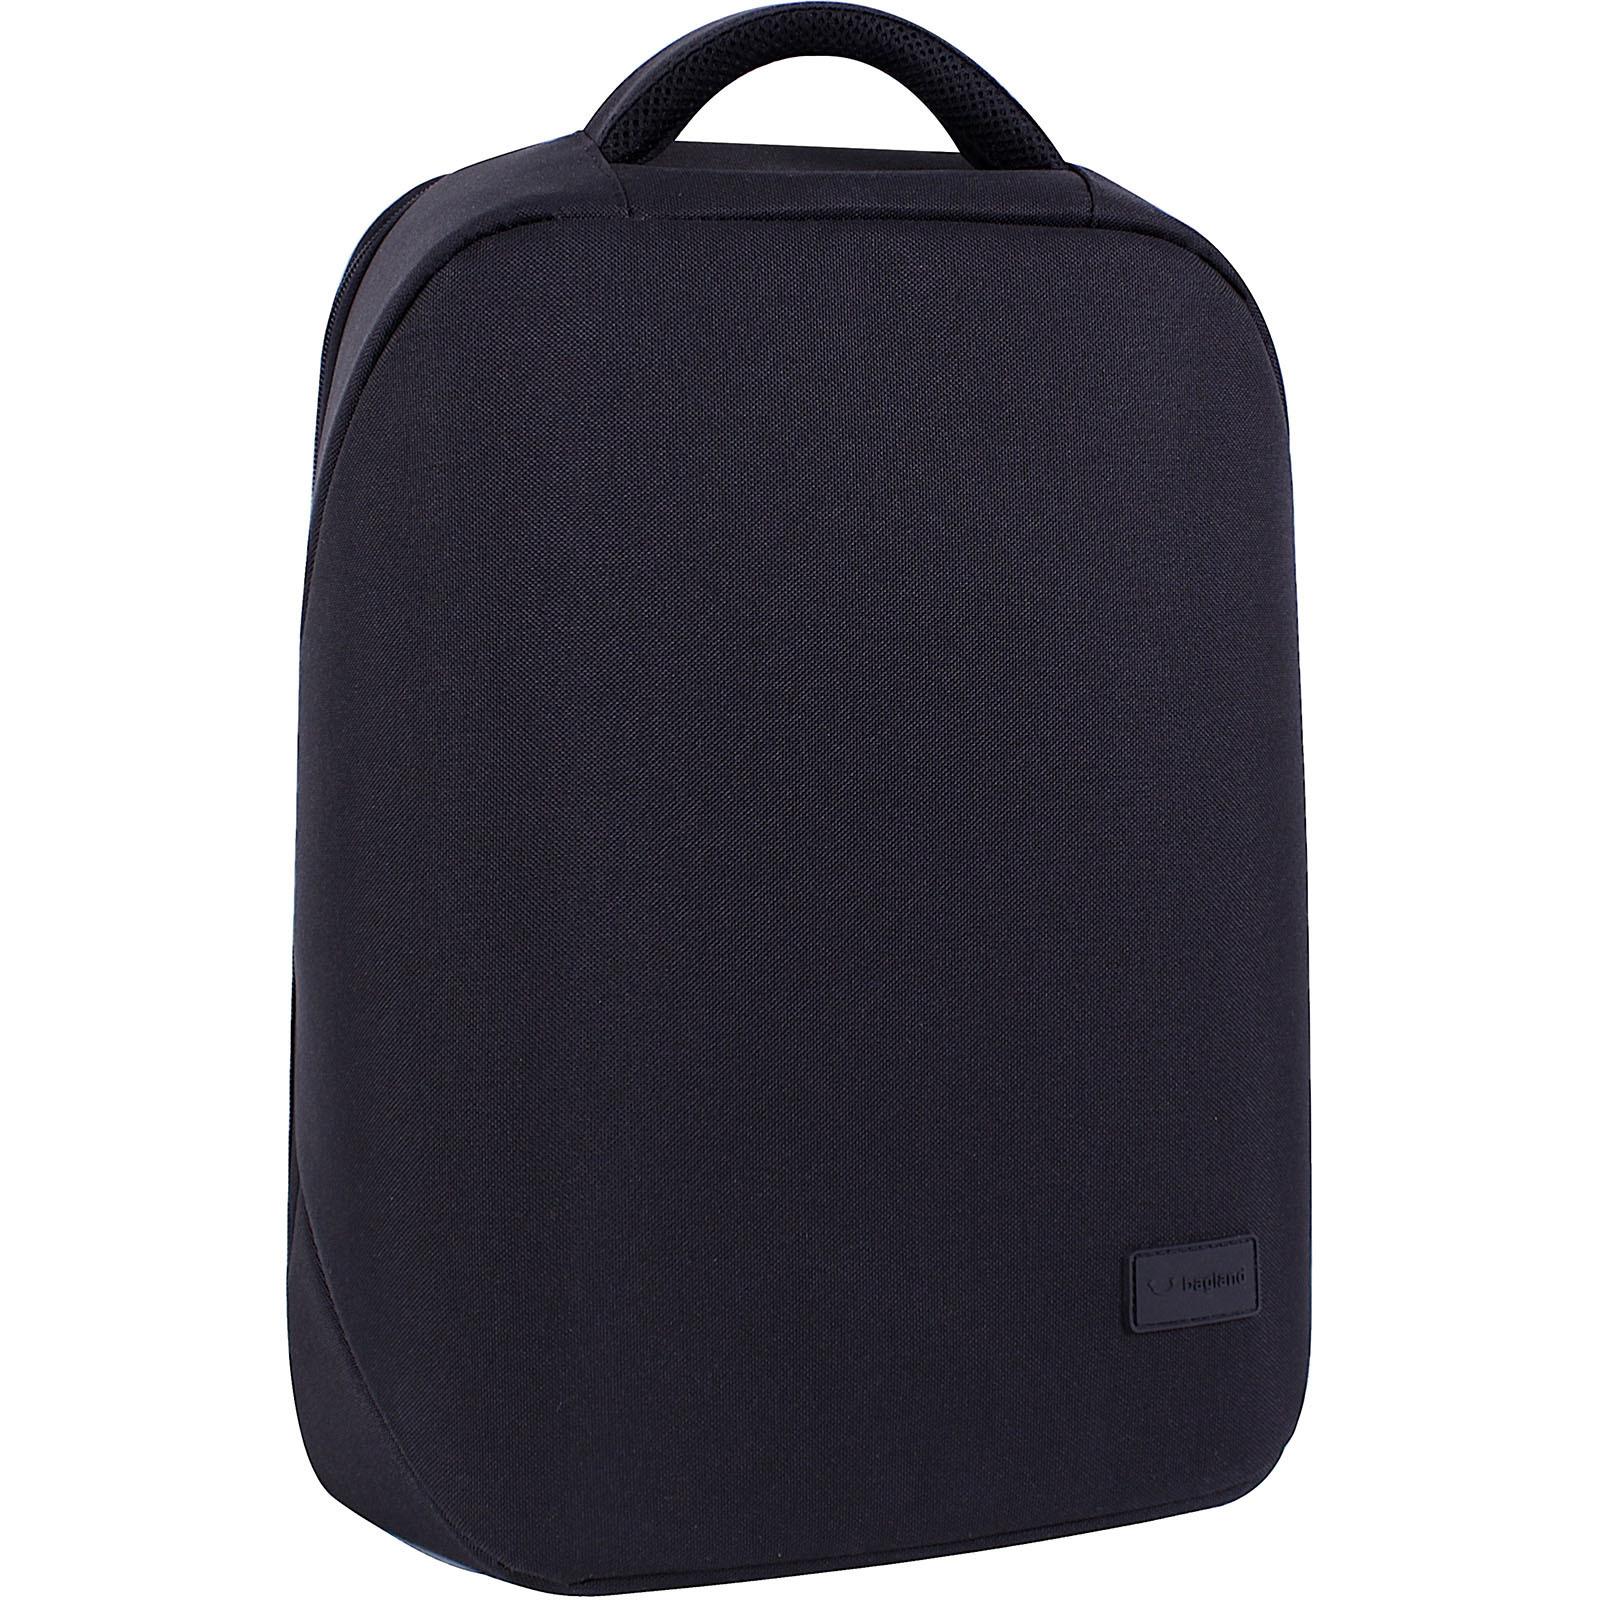 Мужские рюкзаки Рюкзак для ноутбука Bagland Shine 16 л. Чёрный (0058166) IMG_4308.jpg